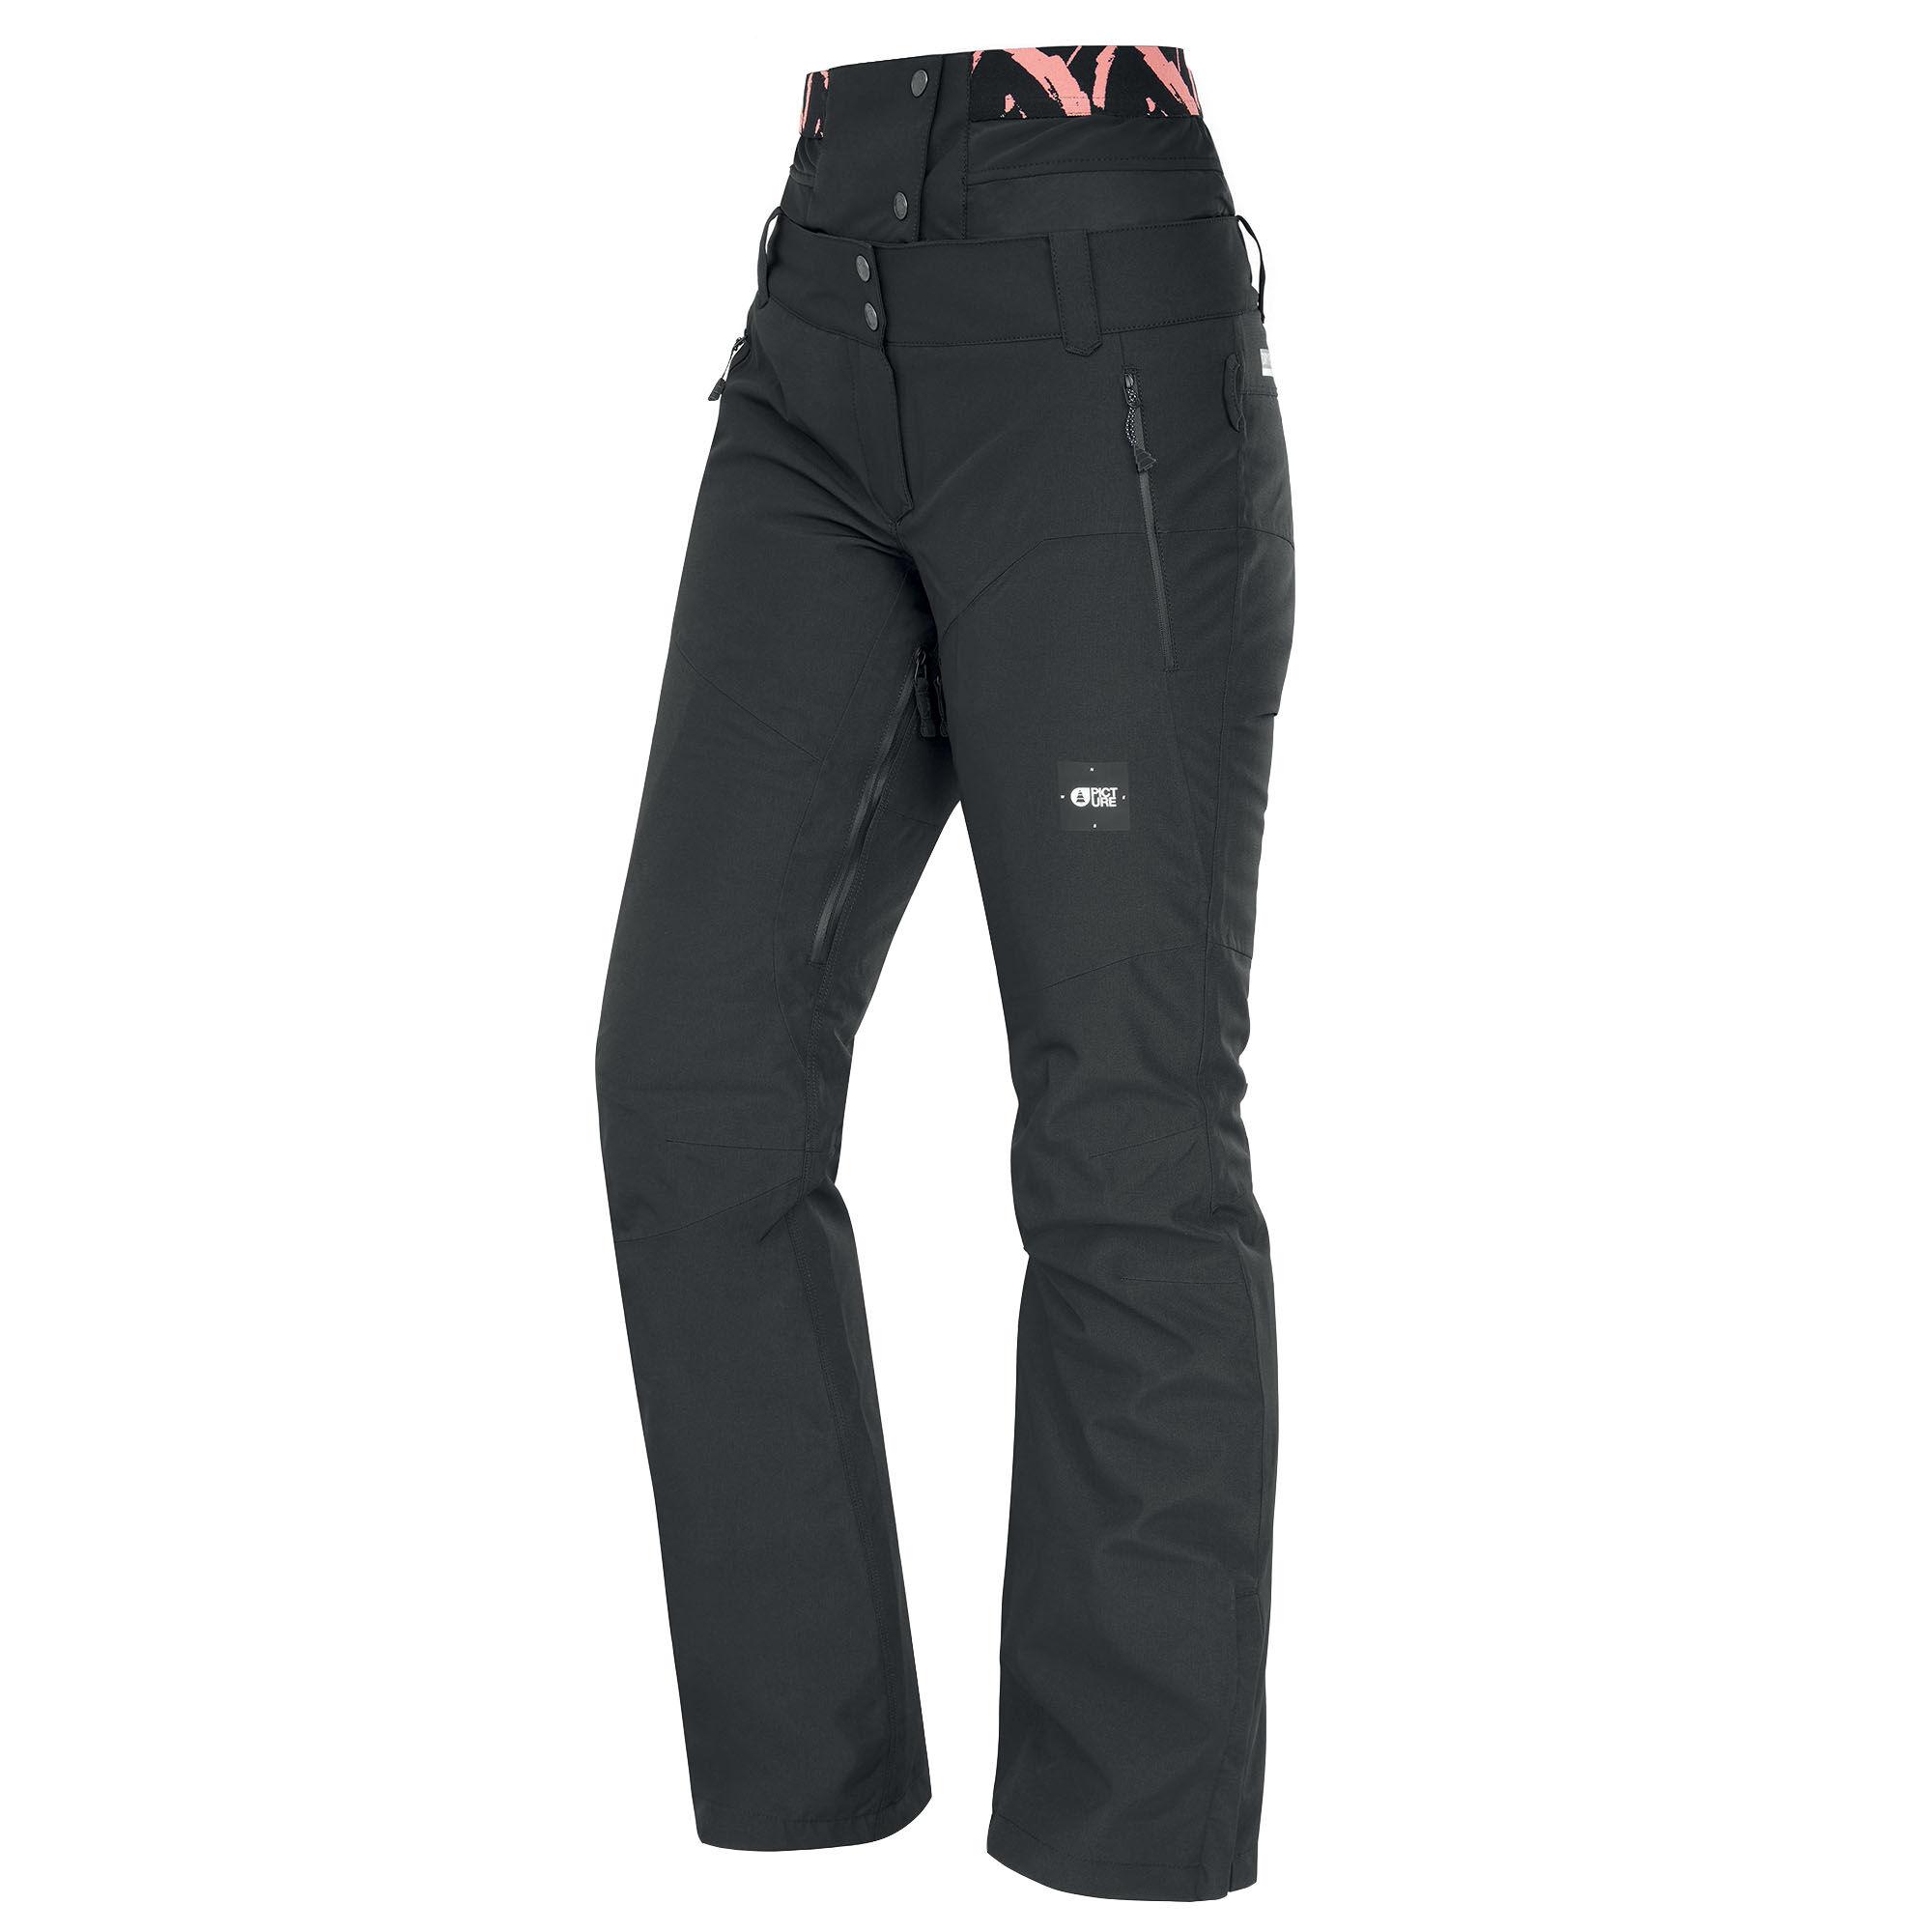 Picture Organic Clothing Women's Exa Snow Pants  - Peonies Black - Size: Medium